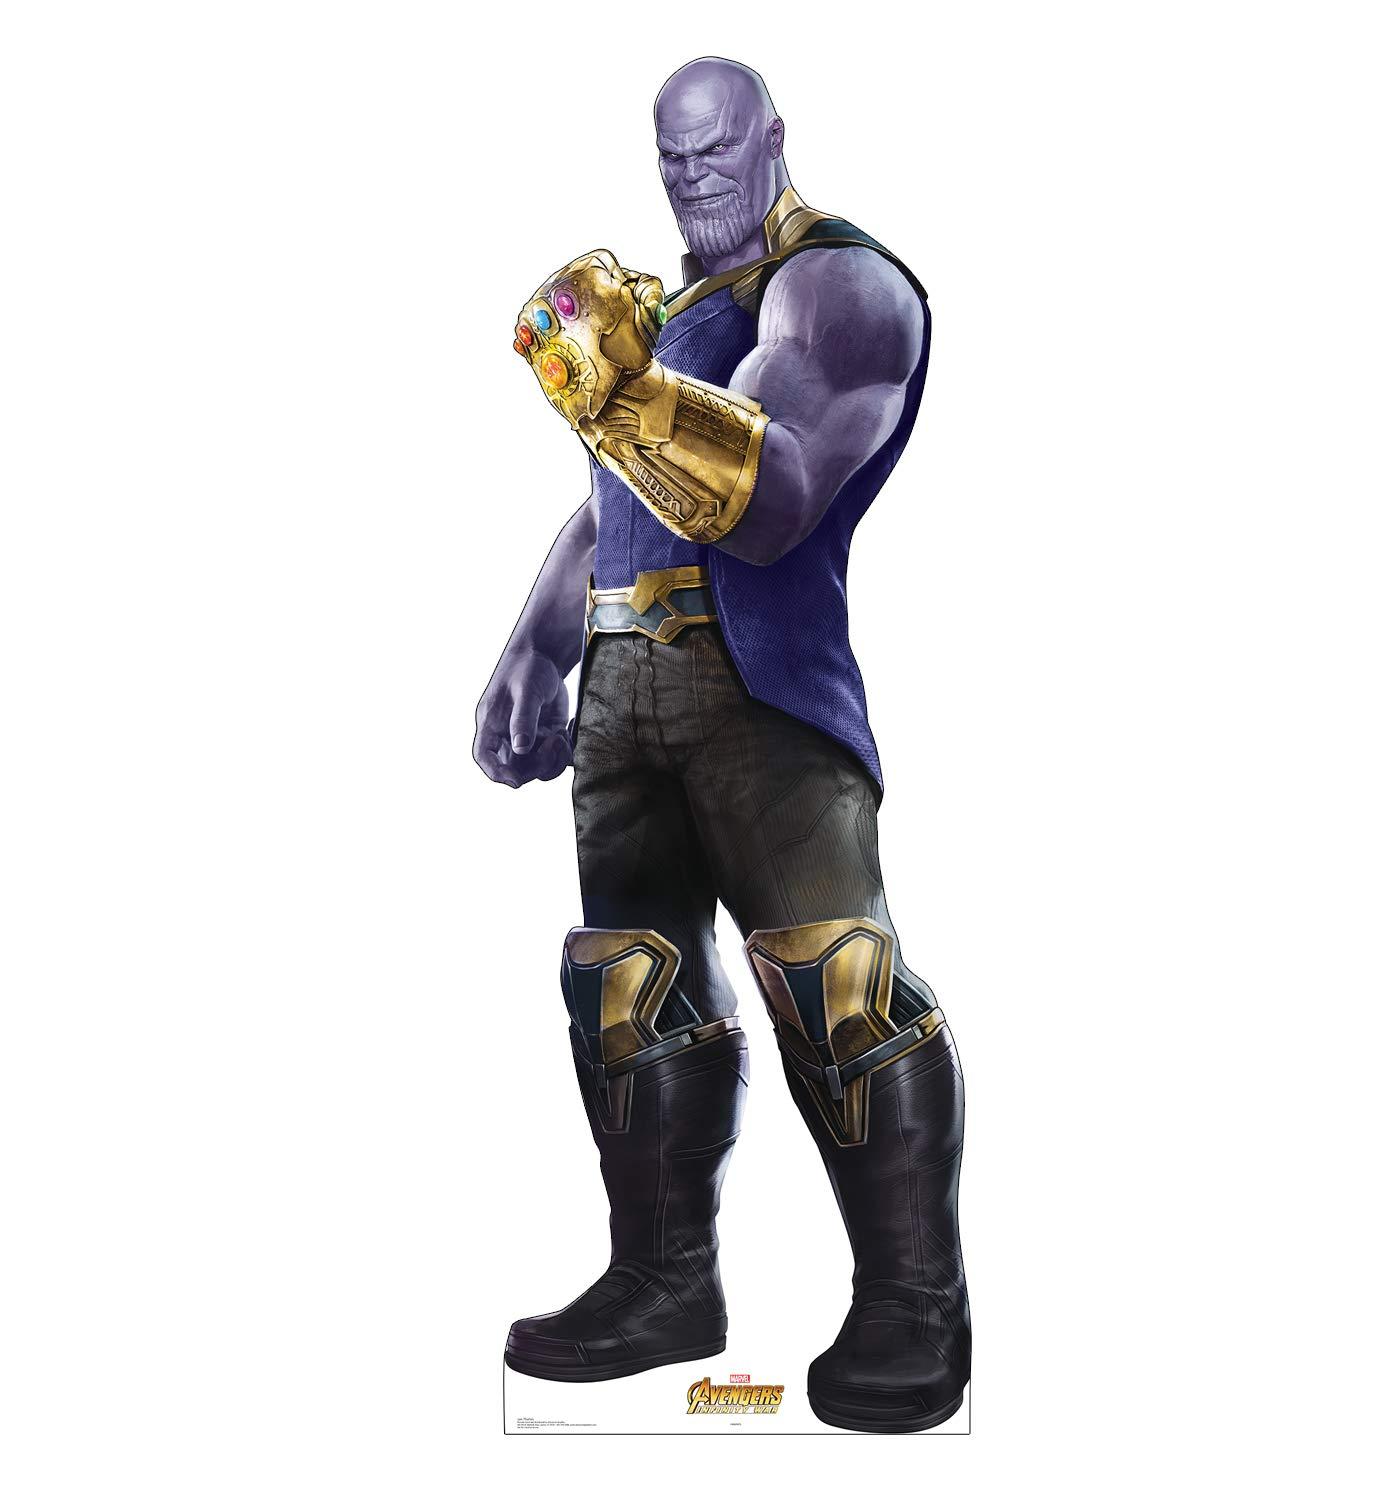 Advanced Graphics Thanos Life Size Cardboard Cutout Standup - Marvel's Avengers: Infinity War (2018 Film)